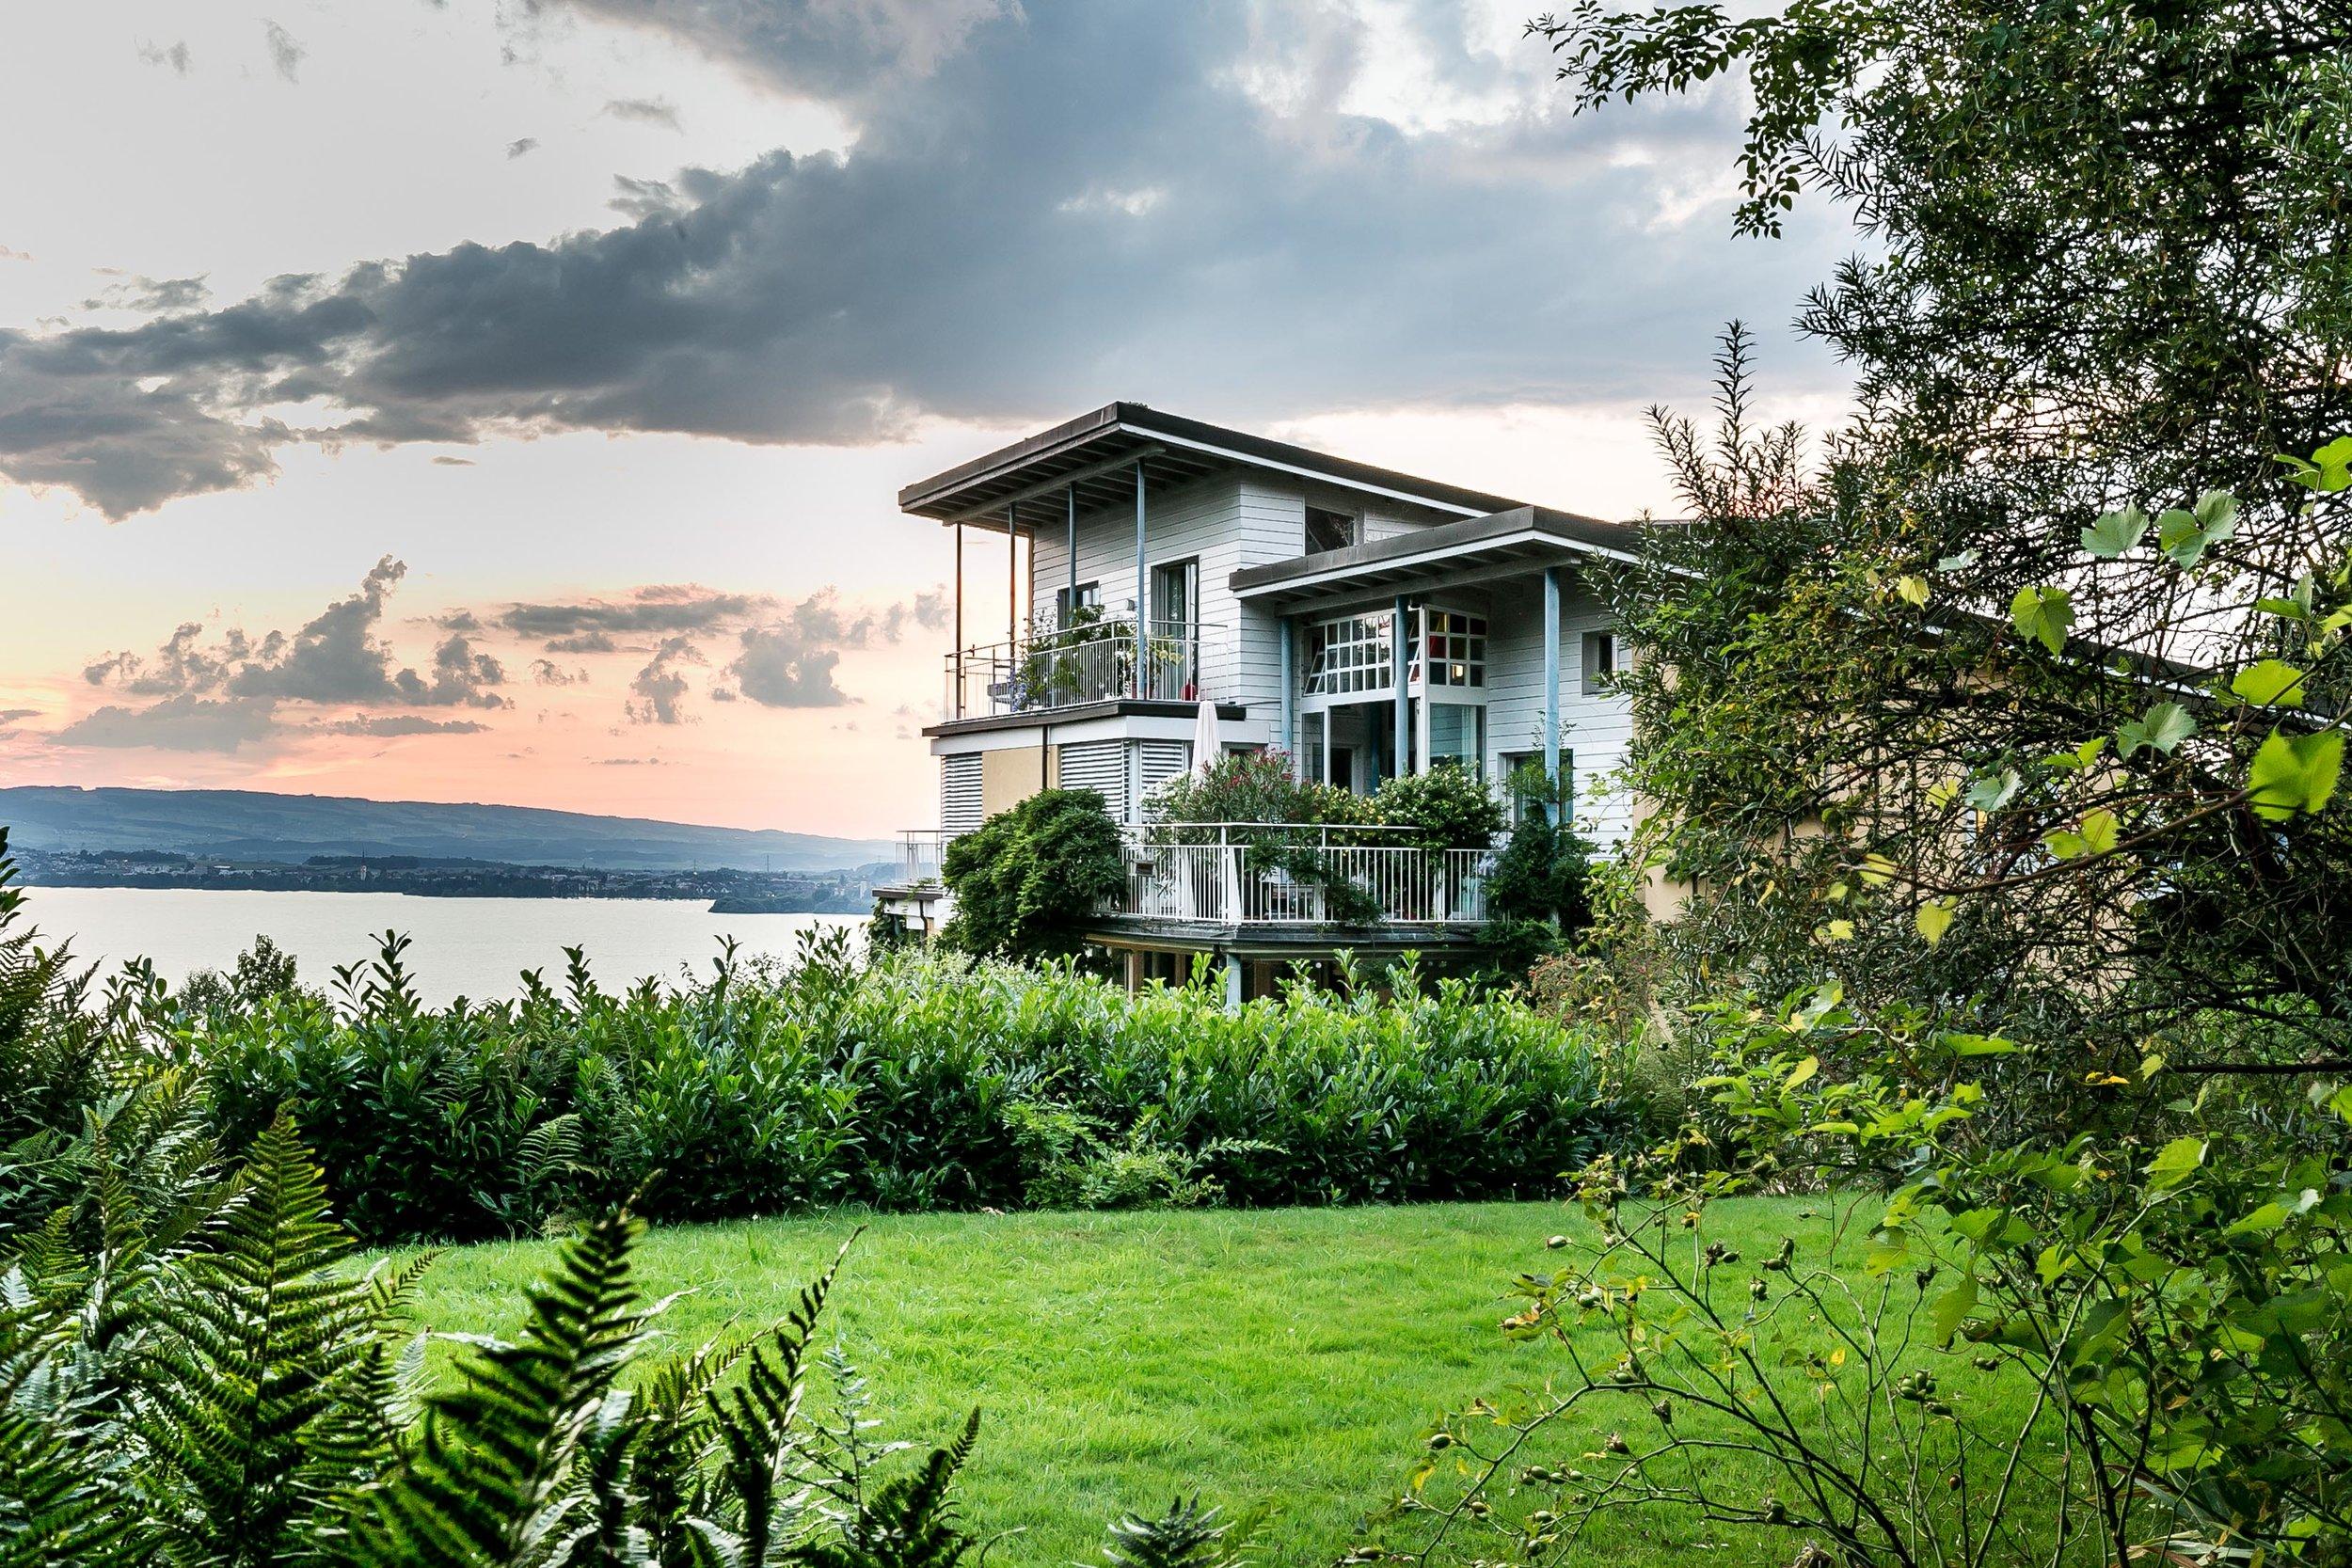 Haus Dalcher_exterior_lowres-7.jpg